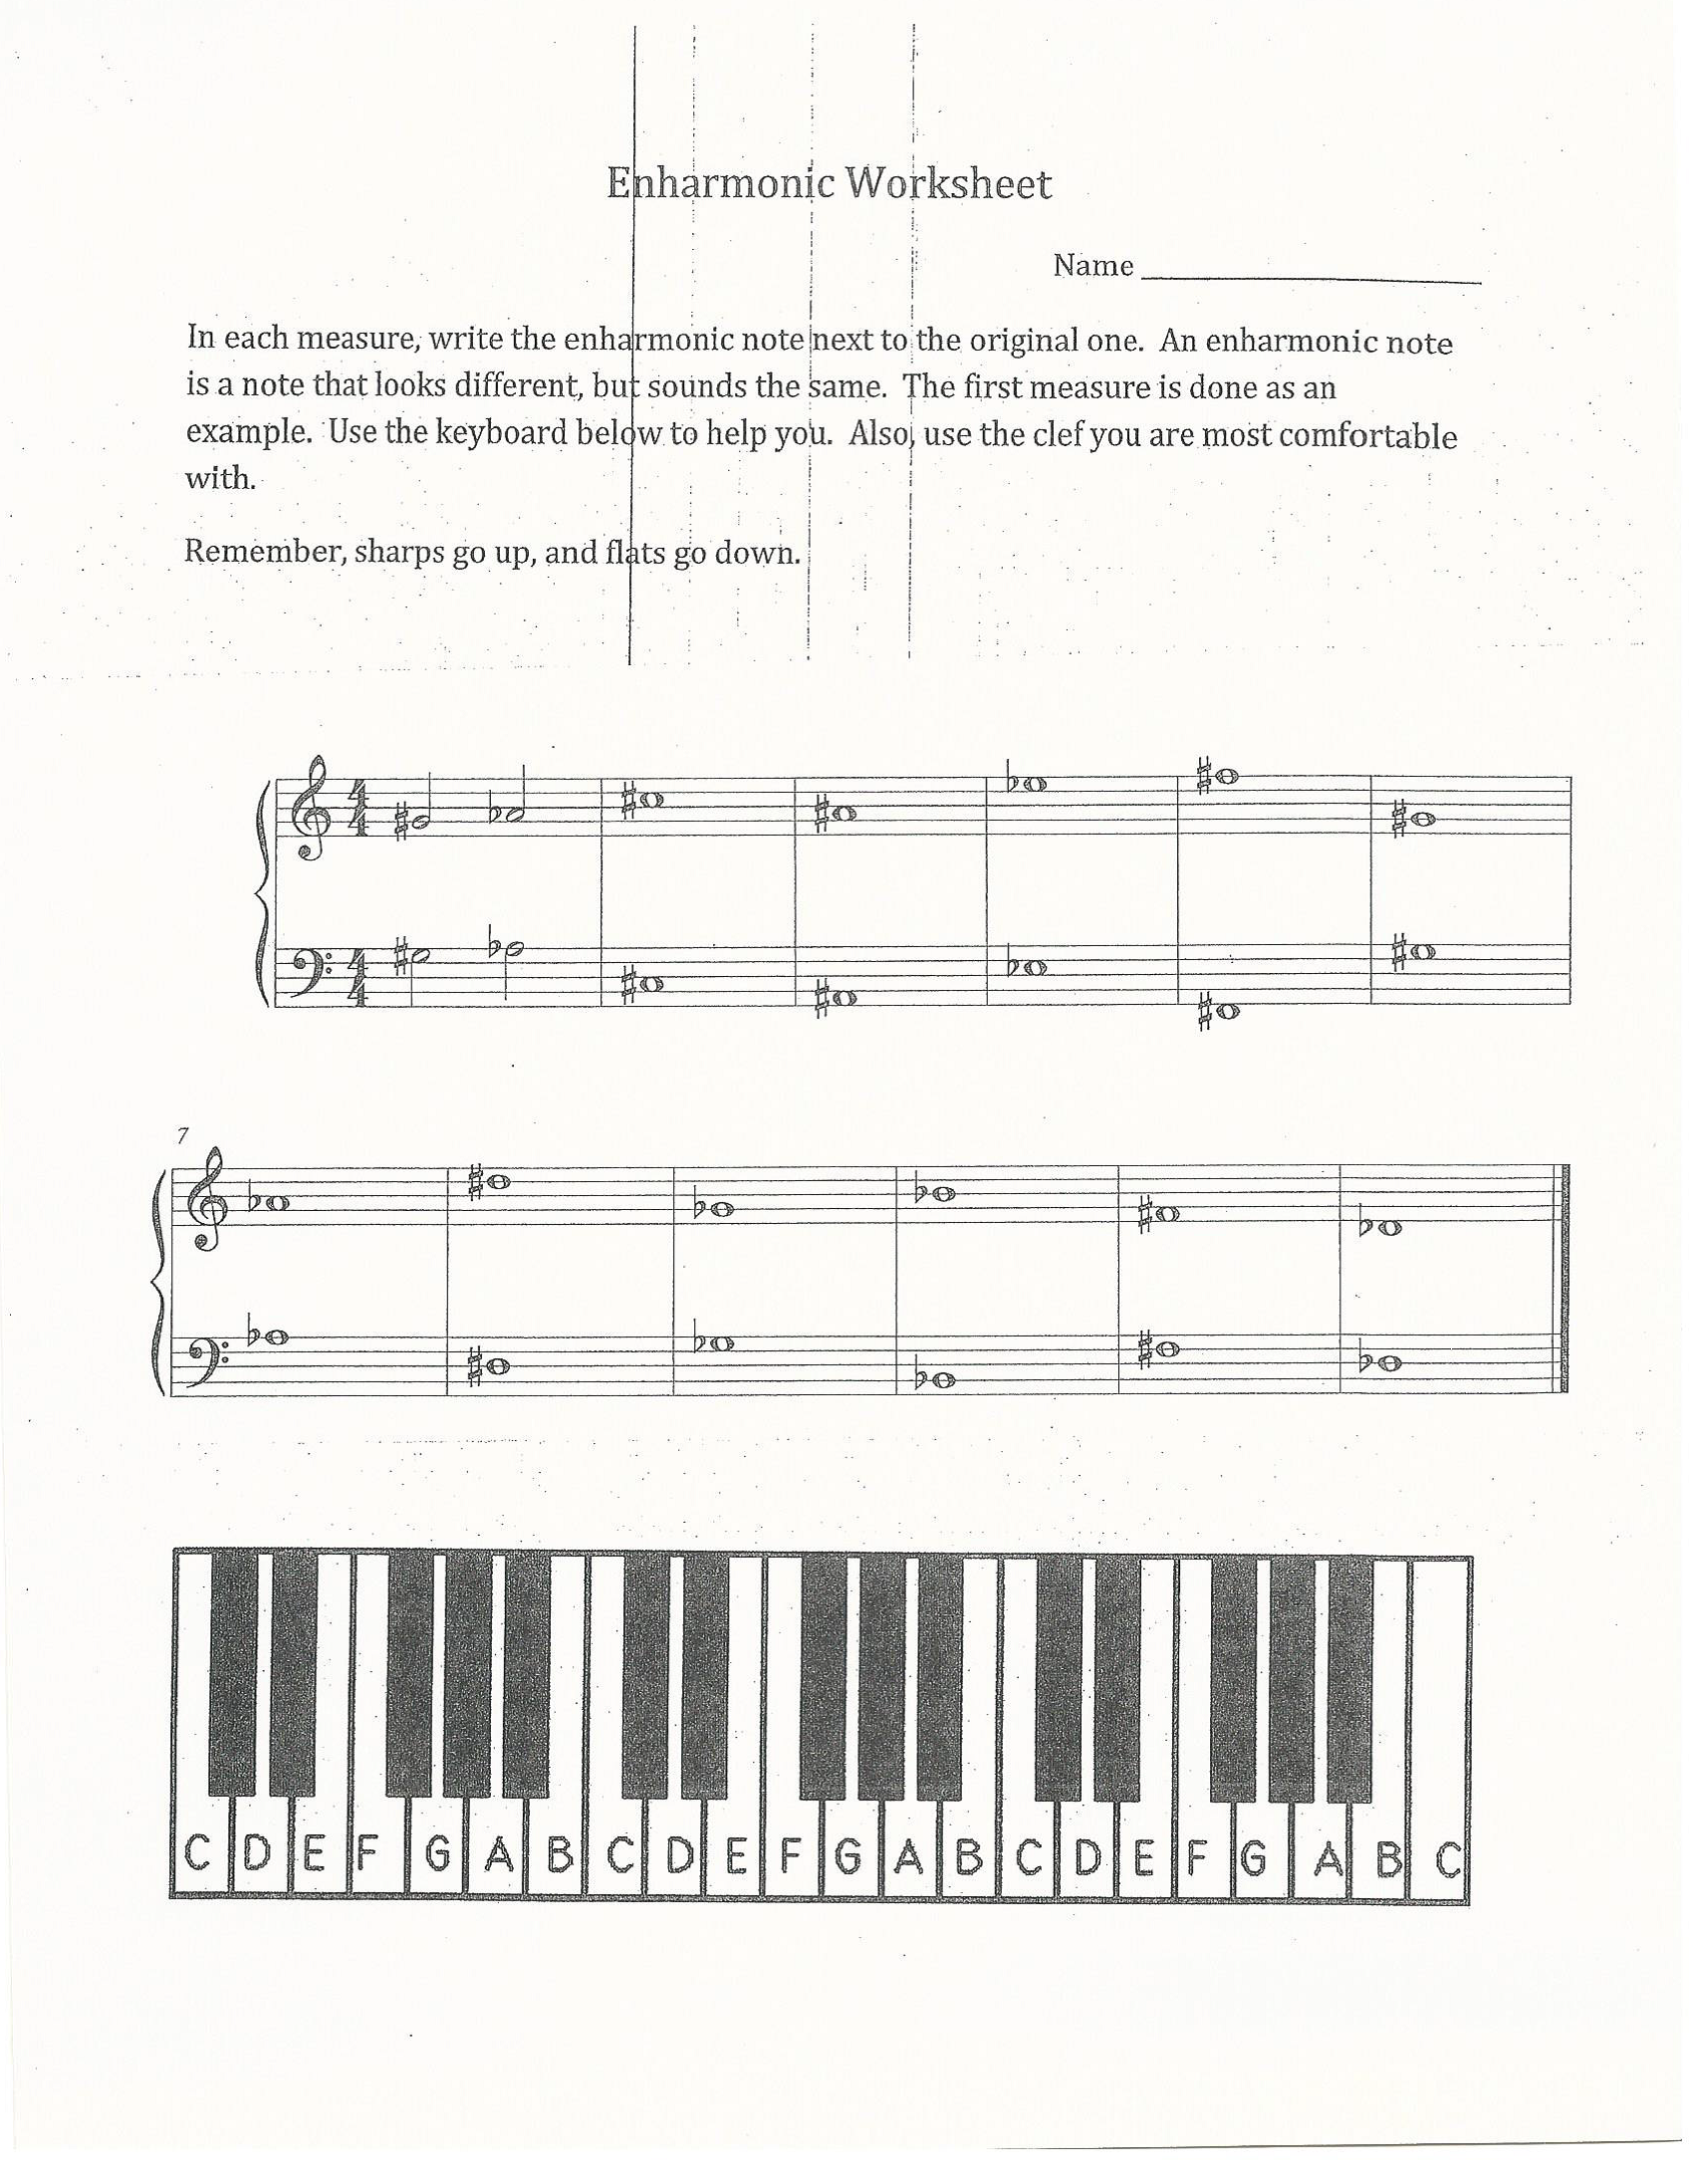 Enharmonic Worksheet I Created This Worksheet To Teach